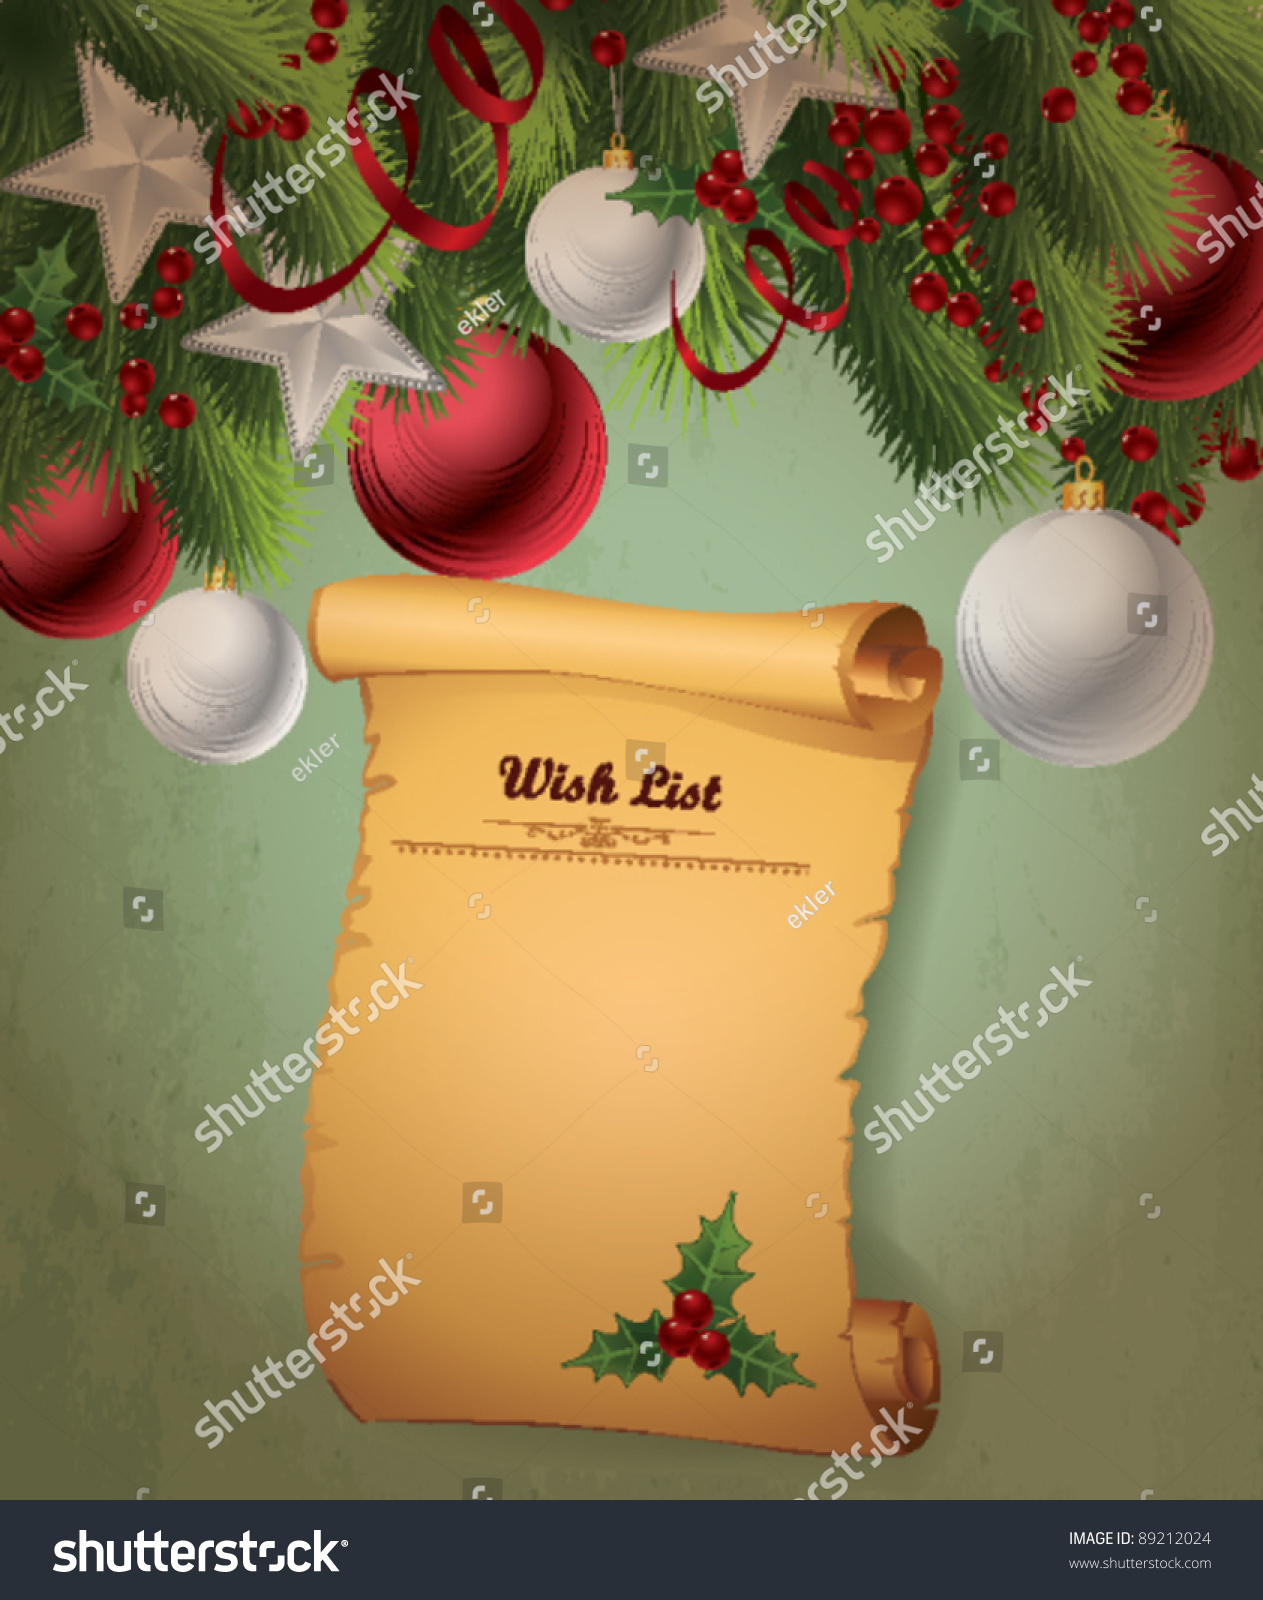 Christmas Wish List Stock Vector Royalty Free 89212024 Shutterstock